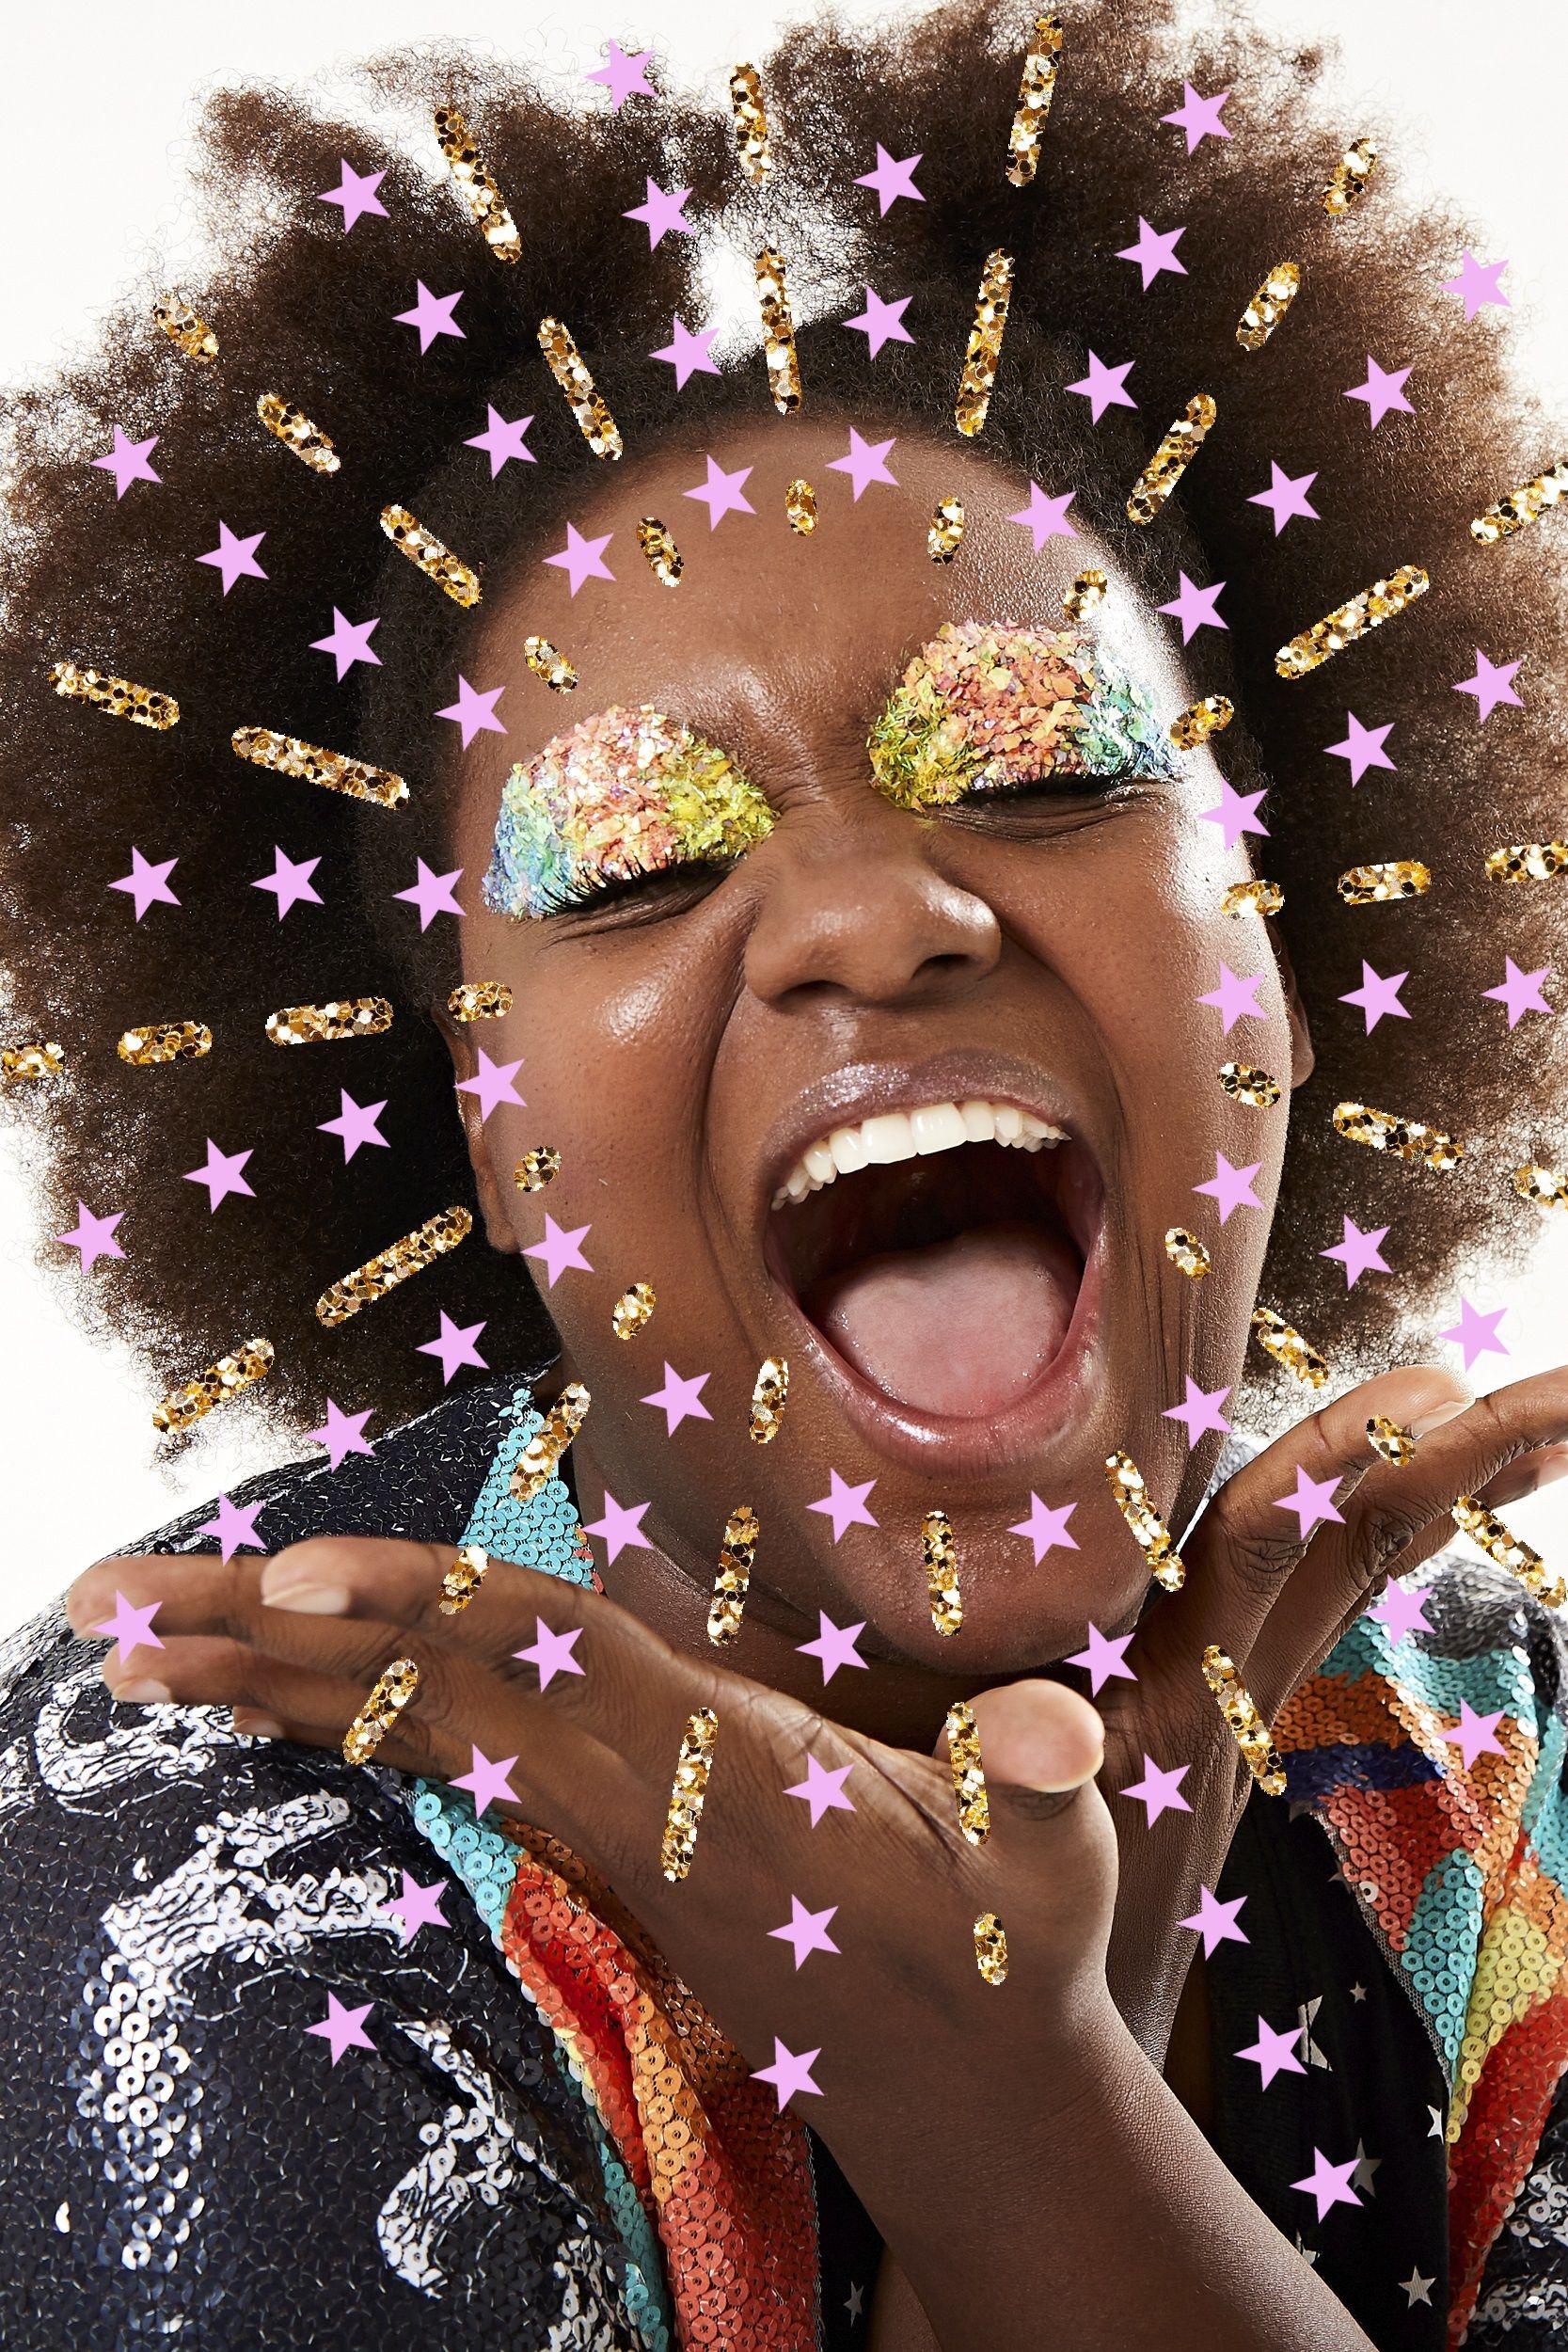 Pin de adoro FARM em abre asas [global] Carnaval, Cartaz